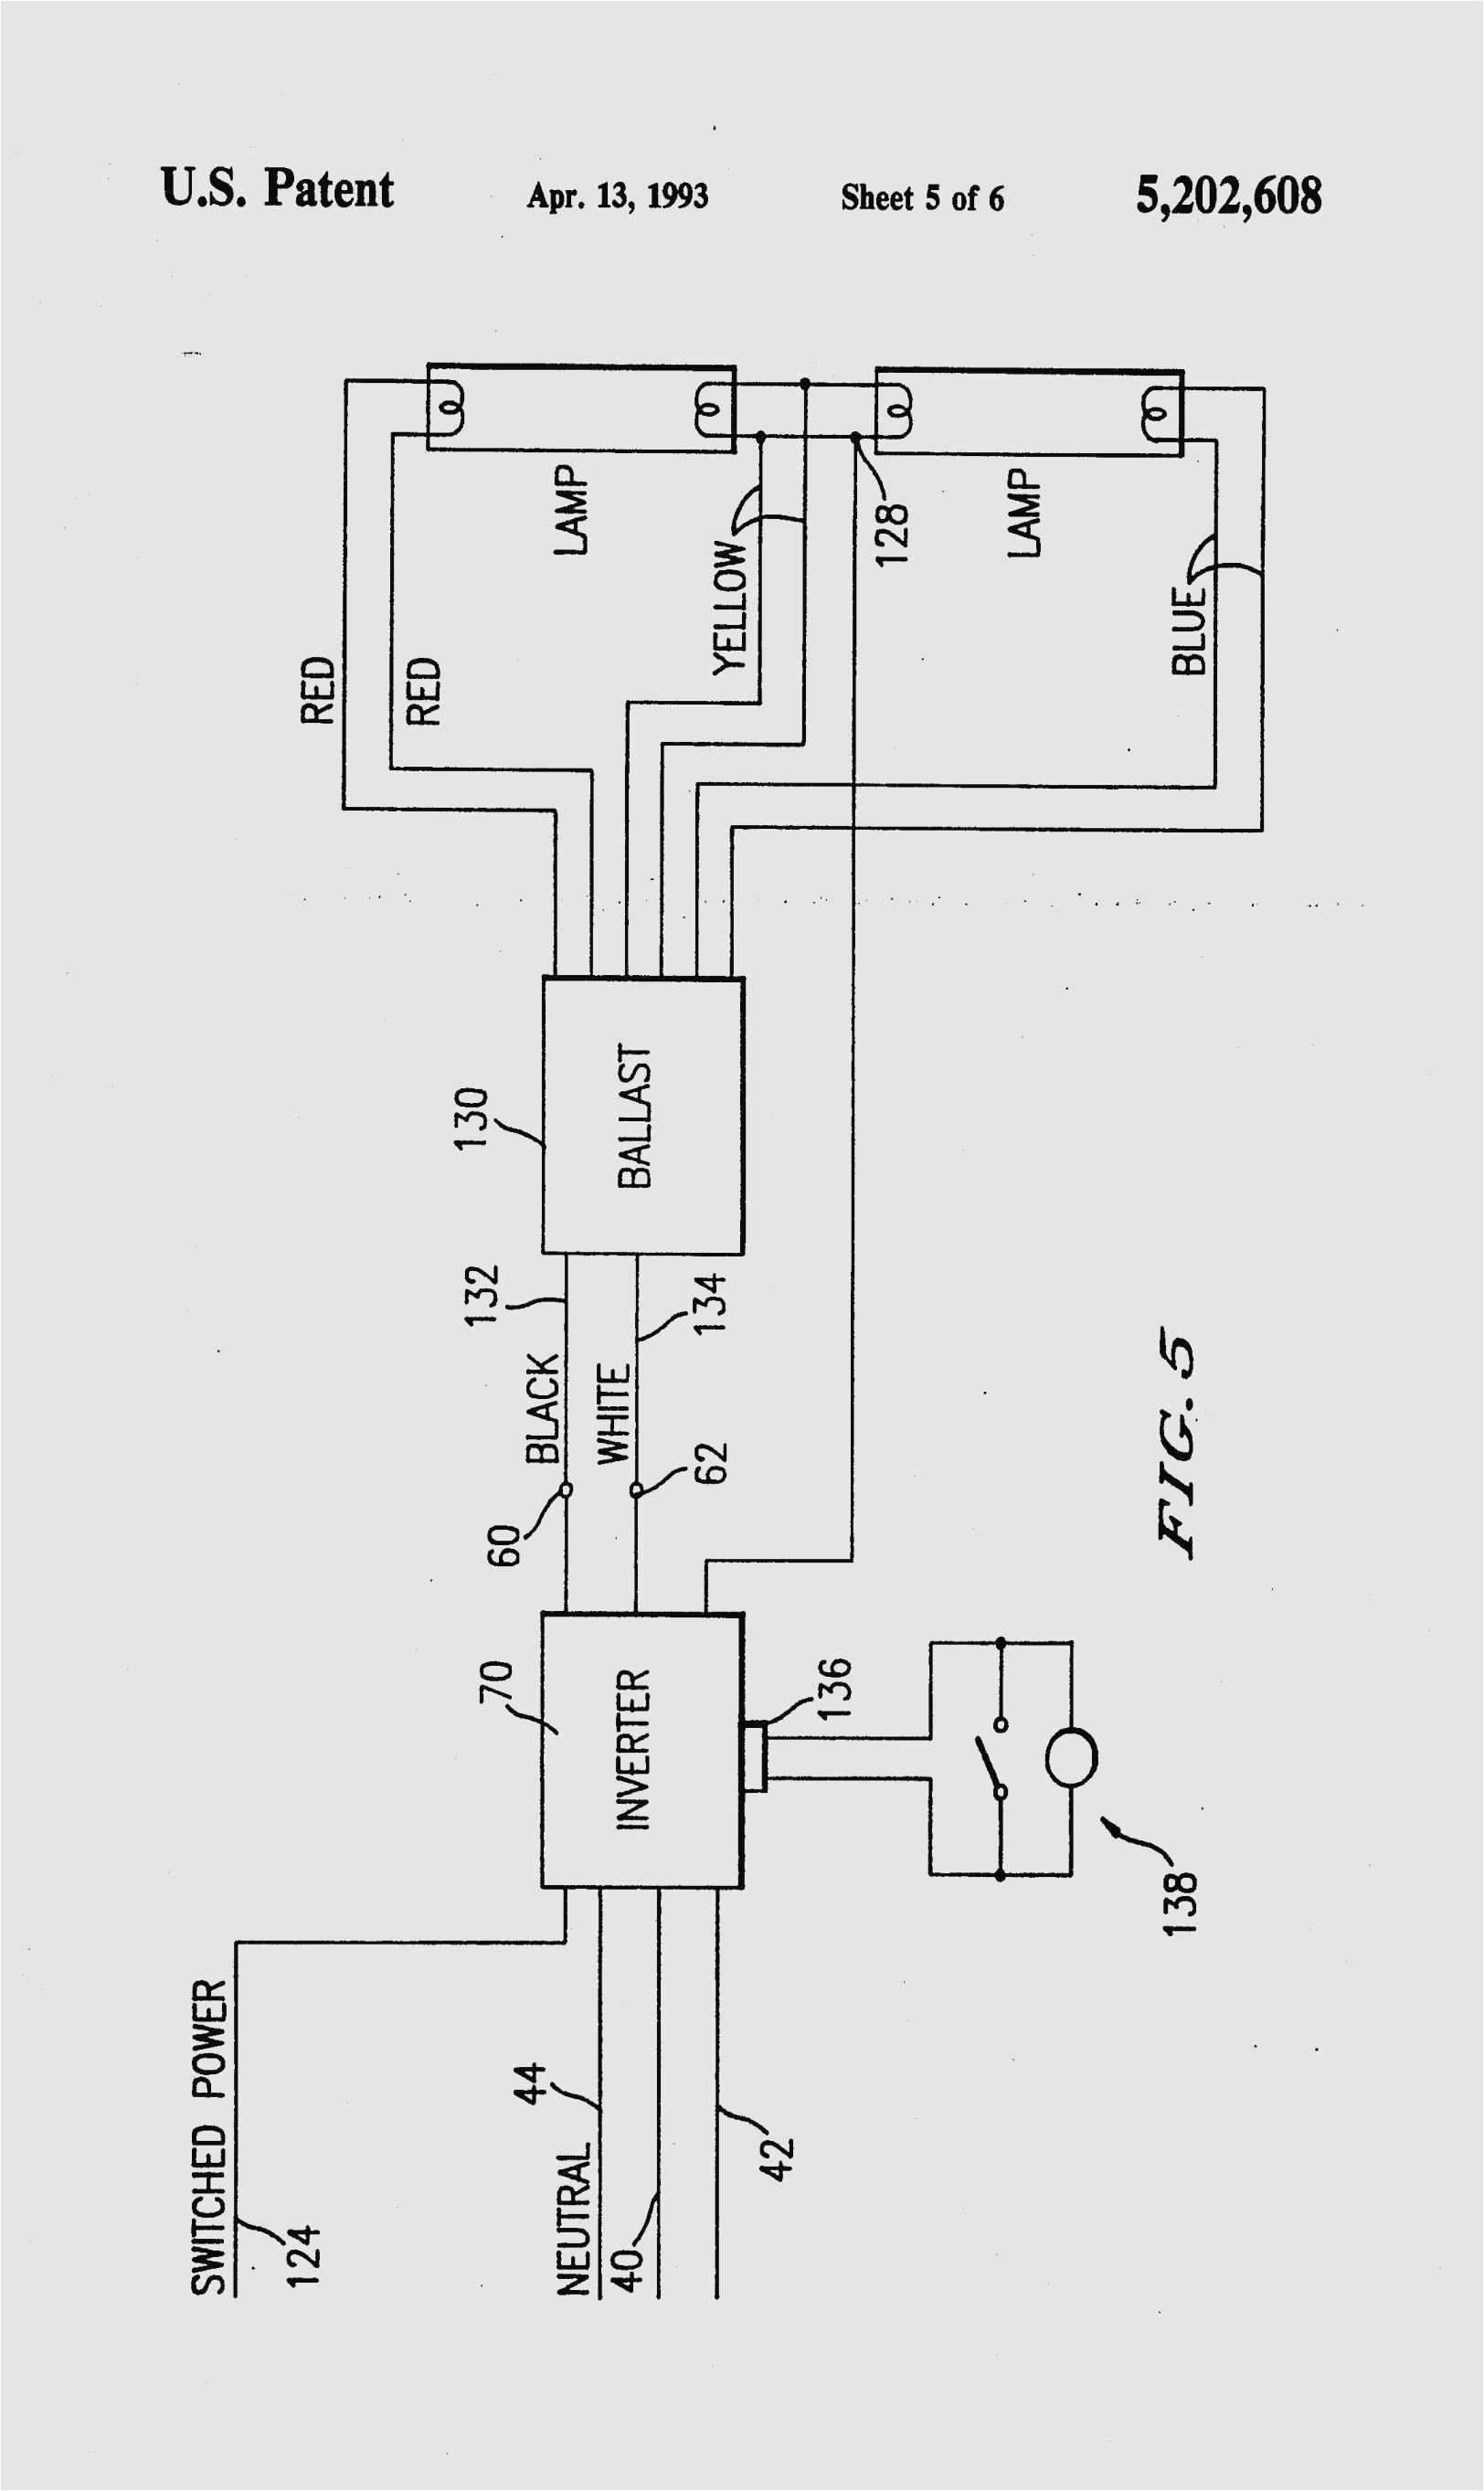 power sentry ps1400 wire diagram diagram data schemapower sentry ps1400 wiring diagram gallery power sentry emergency